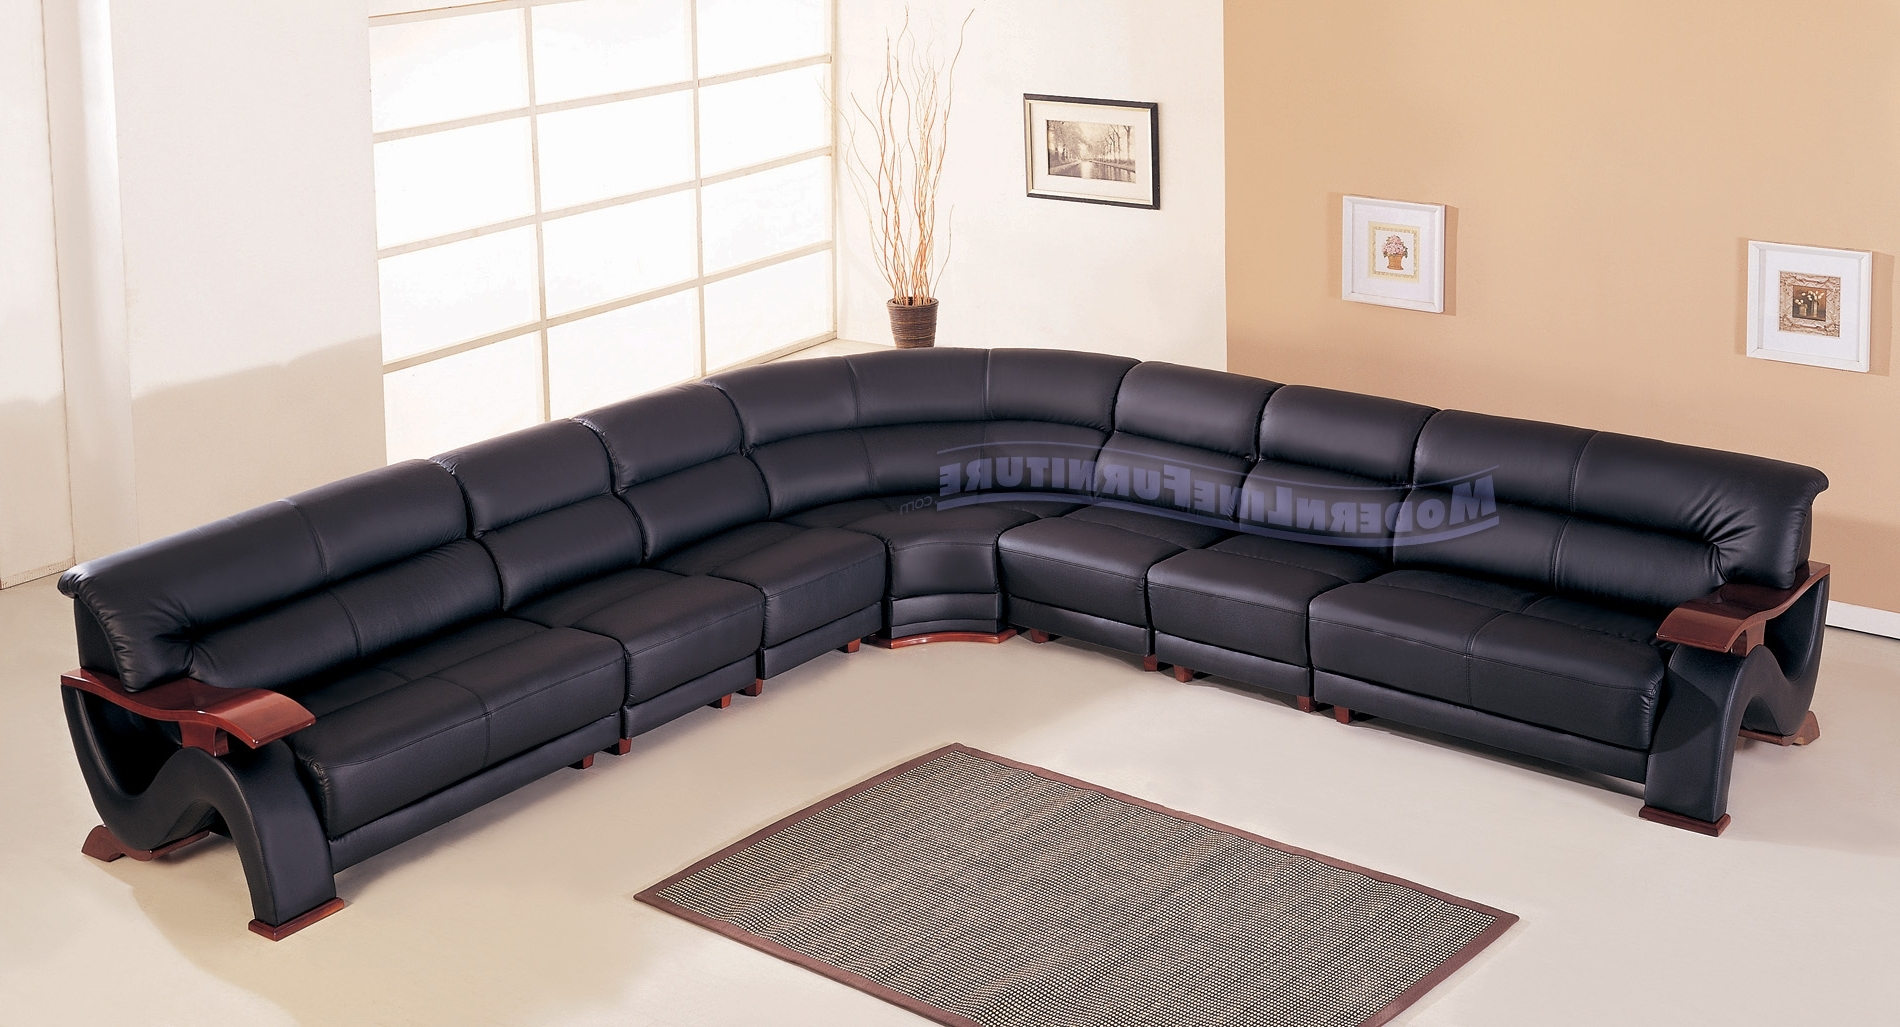 2018 Sectional Sofa Design: Amazing Extra Long Sectional Sofa Extra For Okc Sectional Sofas (View 13 of 15)